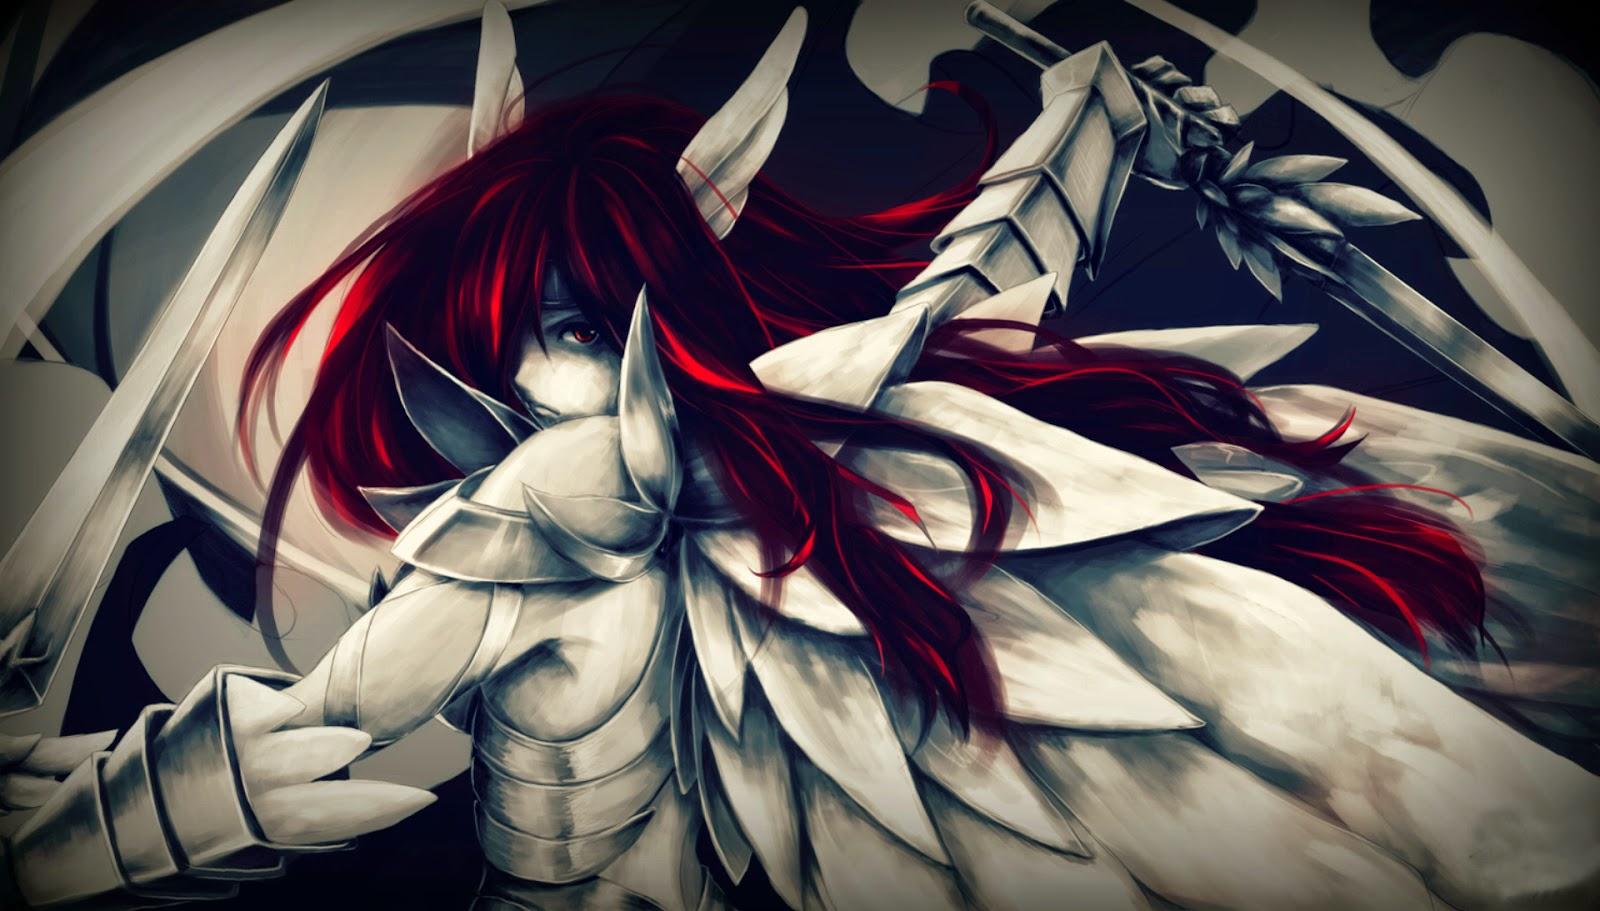 Fairy Tail - Heaven's Wheel Armor Wallpaper